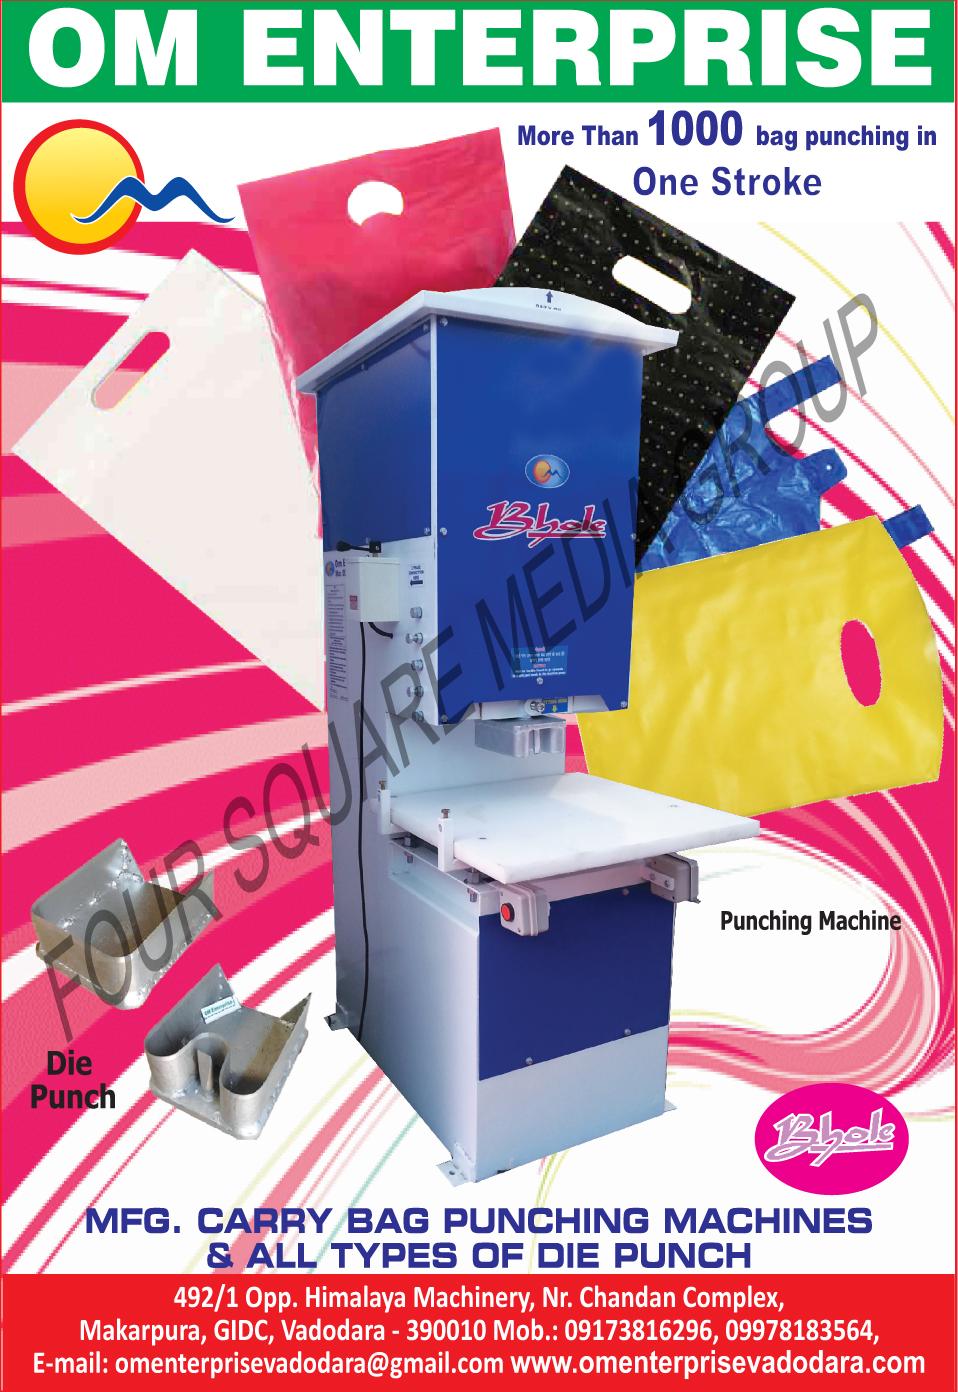 Bag Punching Machines, Carry Bag Punching Machines, Die Punches, Punching Machines